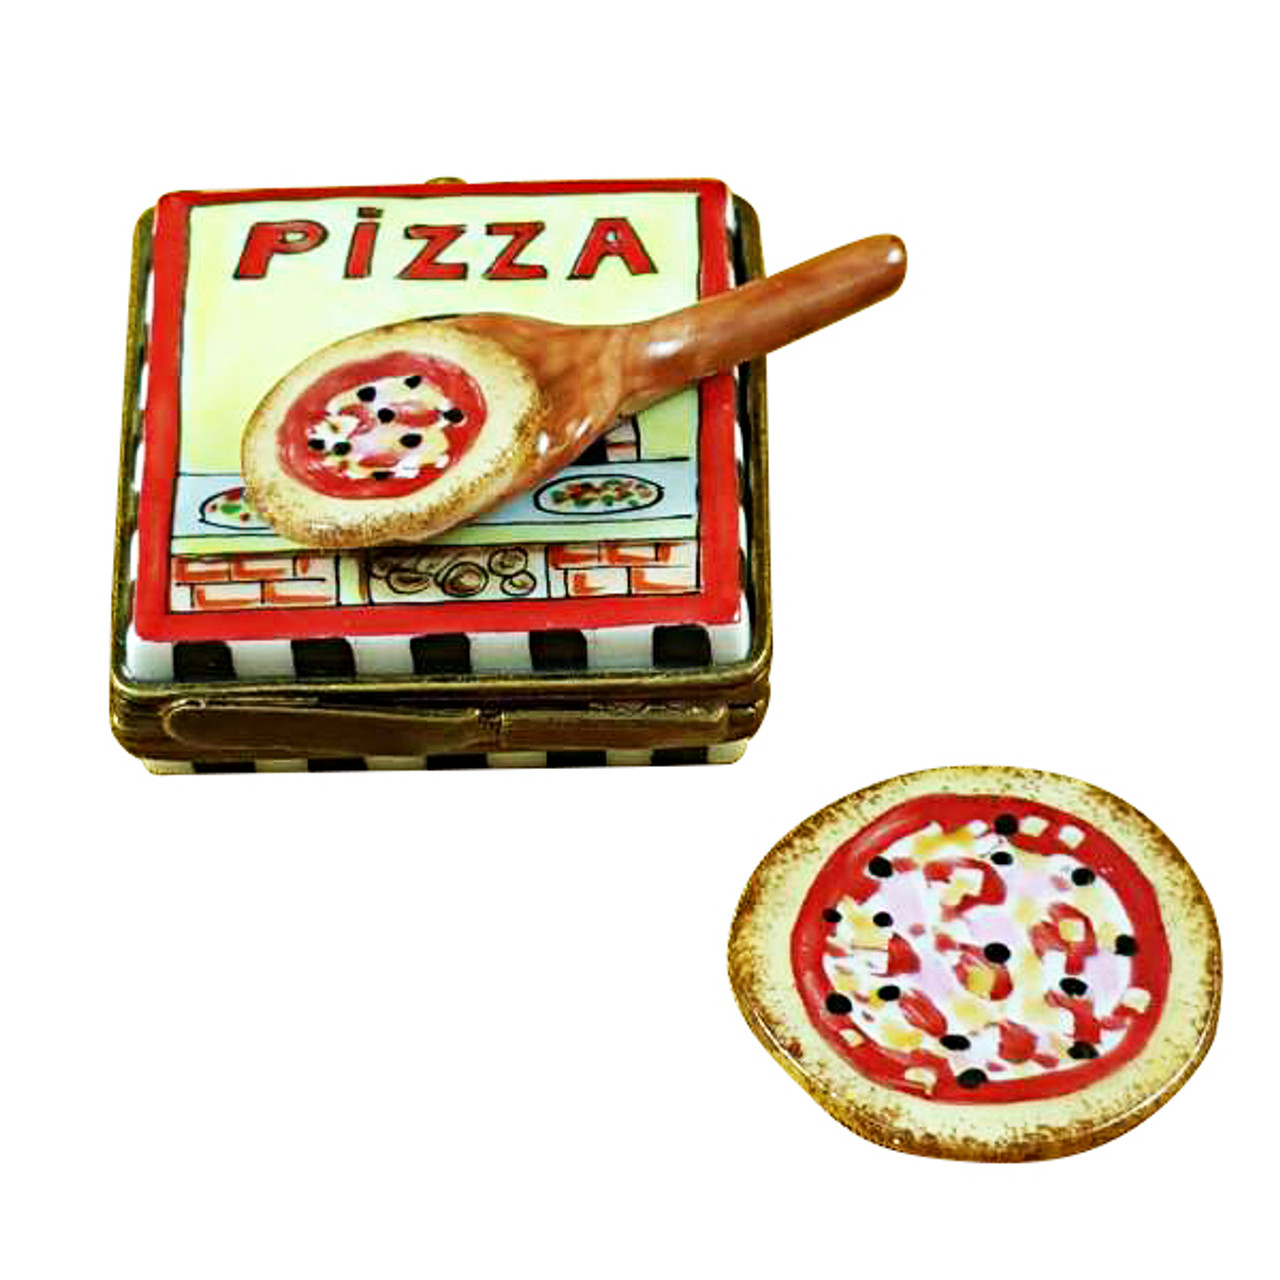 Pizza Box W/Pizza Rochard Limoges Box